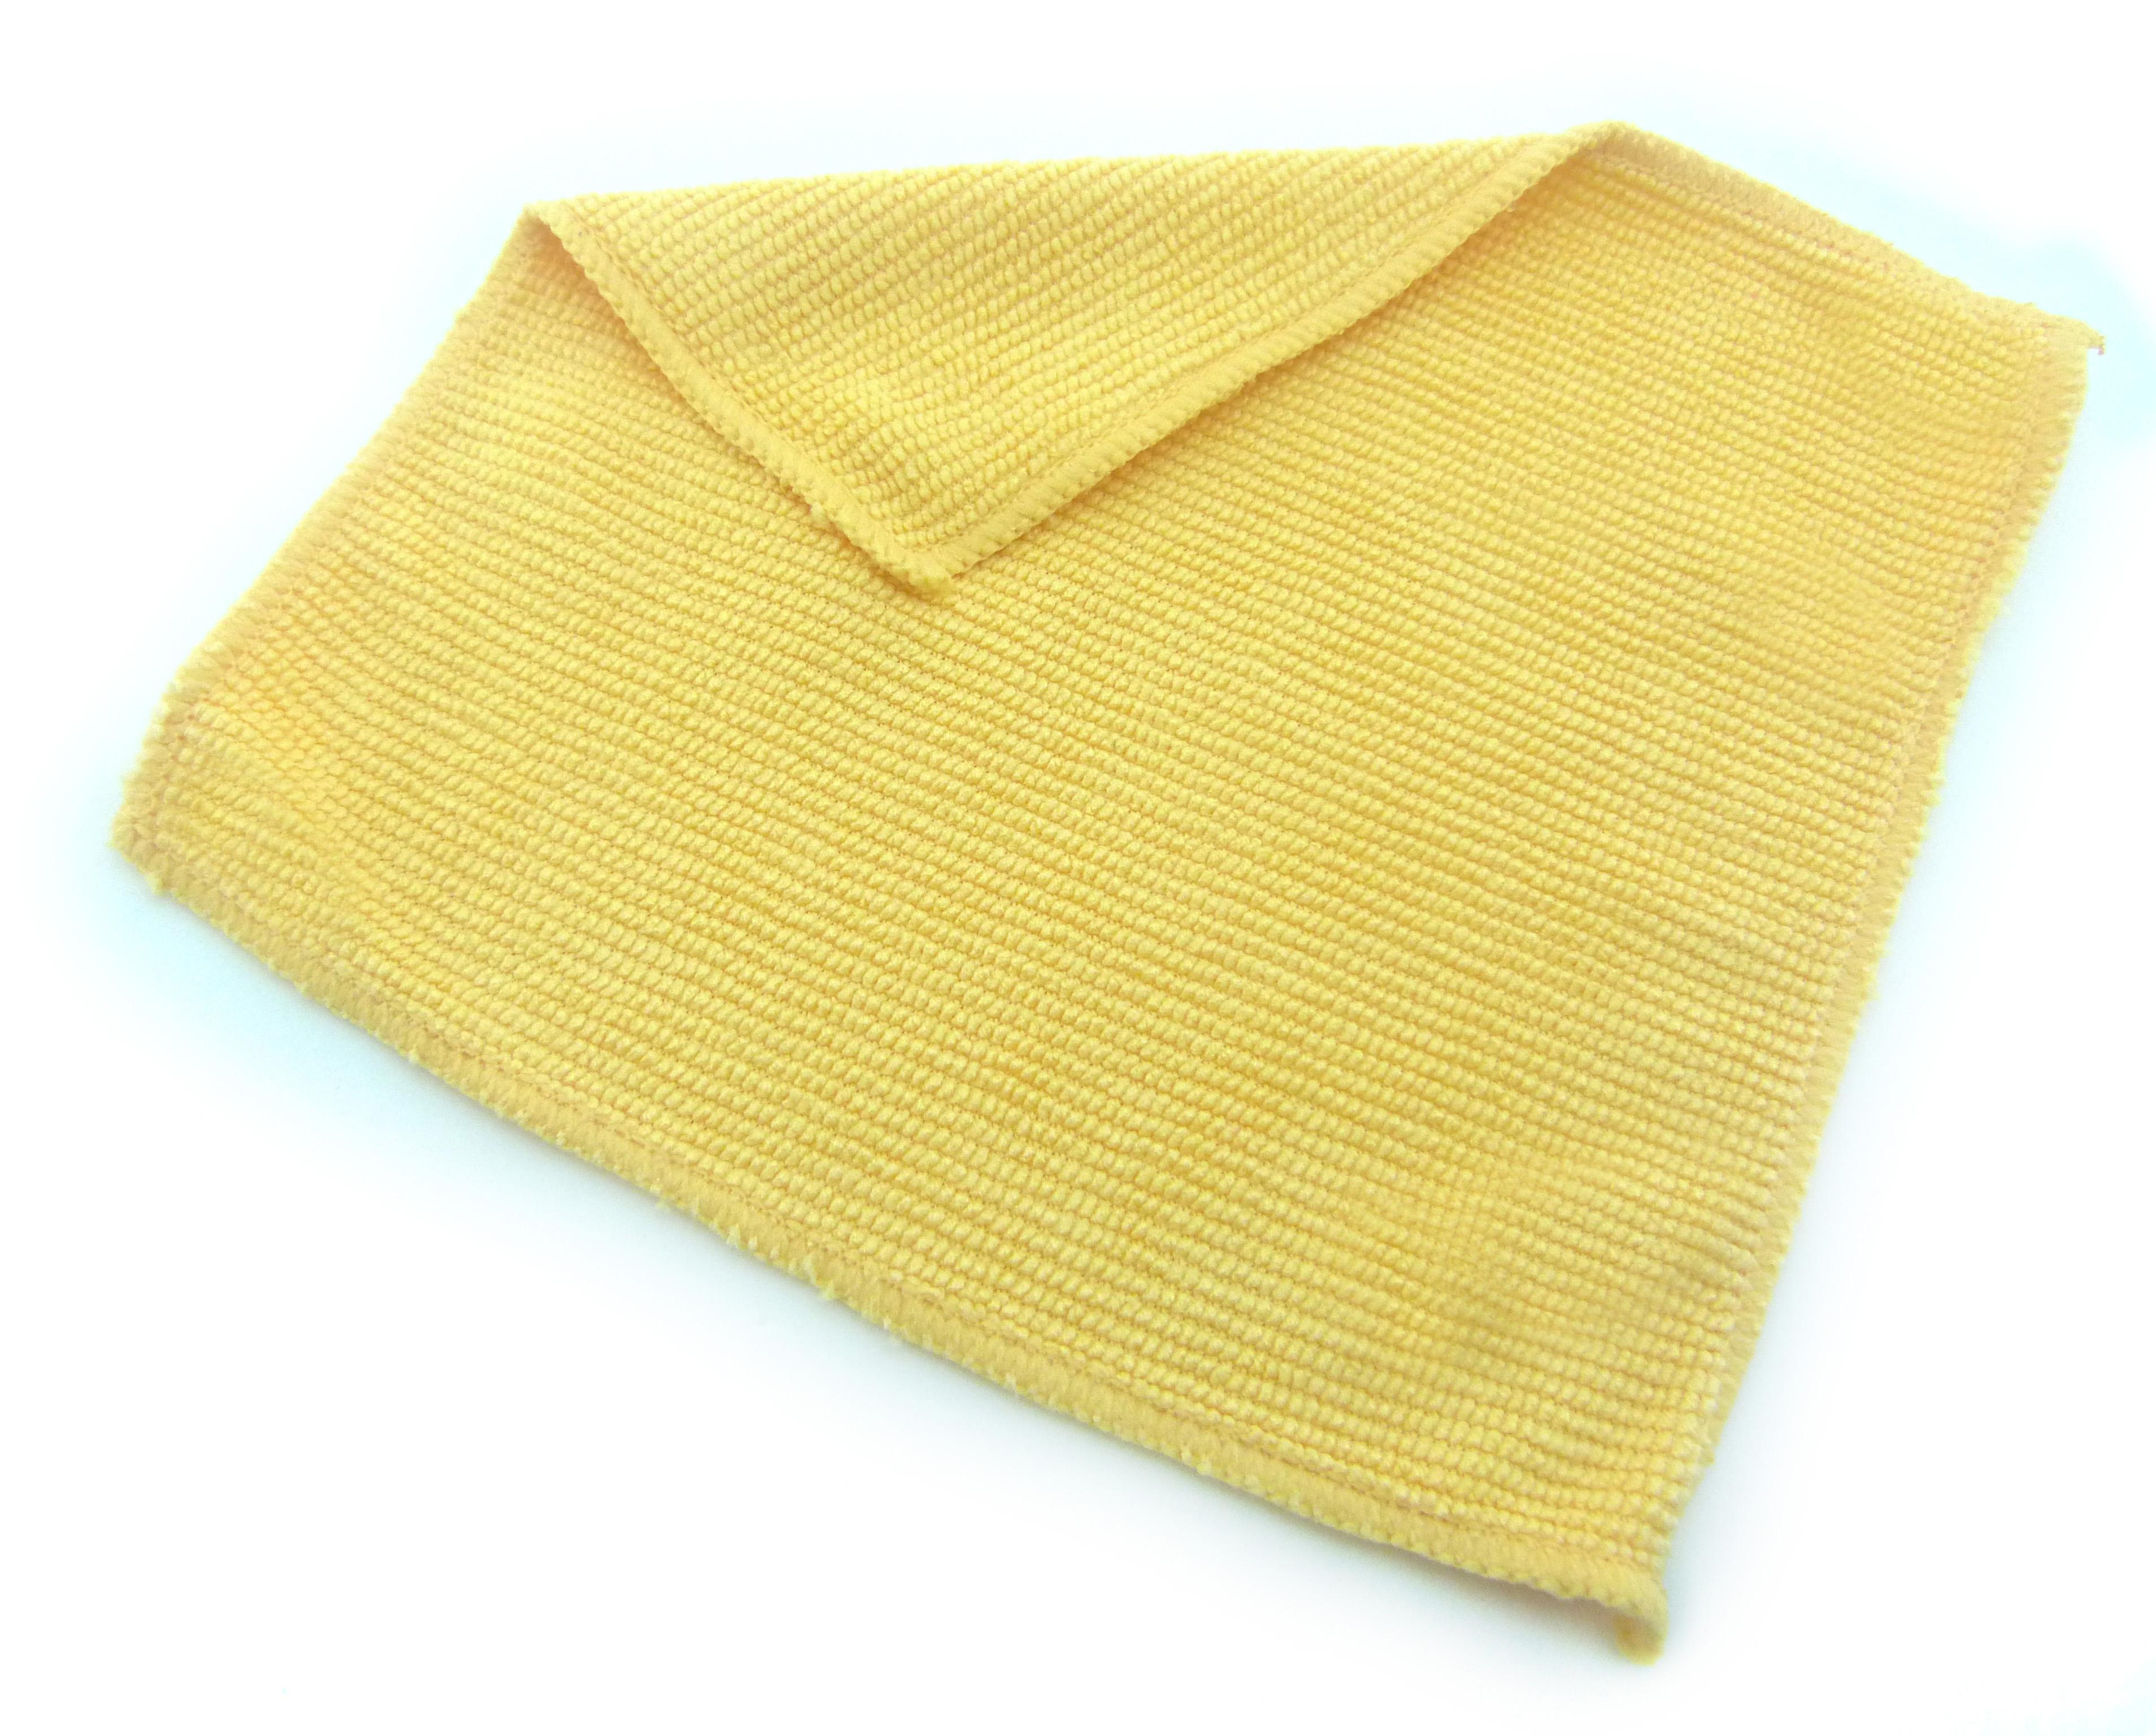 17F0515 - Microfibra Felpuda 15x15 Amarela  -Contém 1 Peça